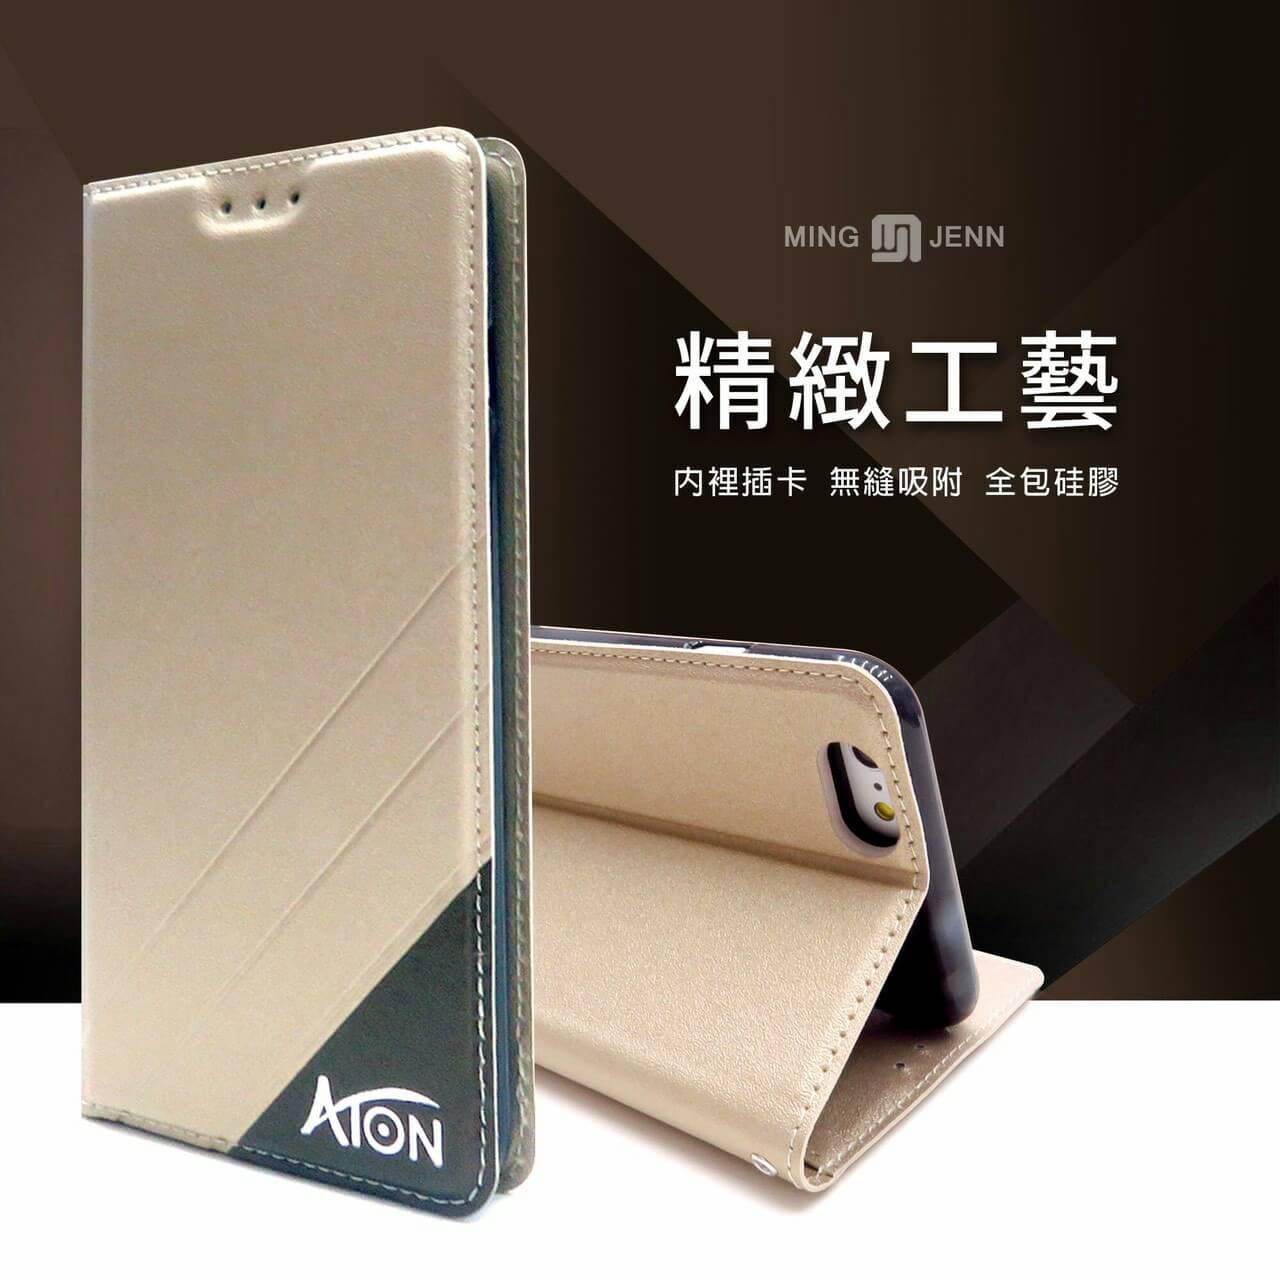 ATON 鐵塔系列 SAMSUNG Galaxy A7 (2018)  手機皮套 隱扣 側翻皮套 可立式 可插卡 含內袋 手機套 保護殼